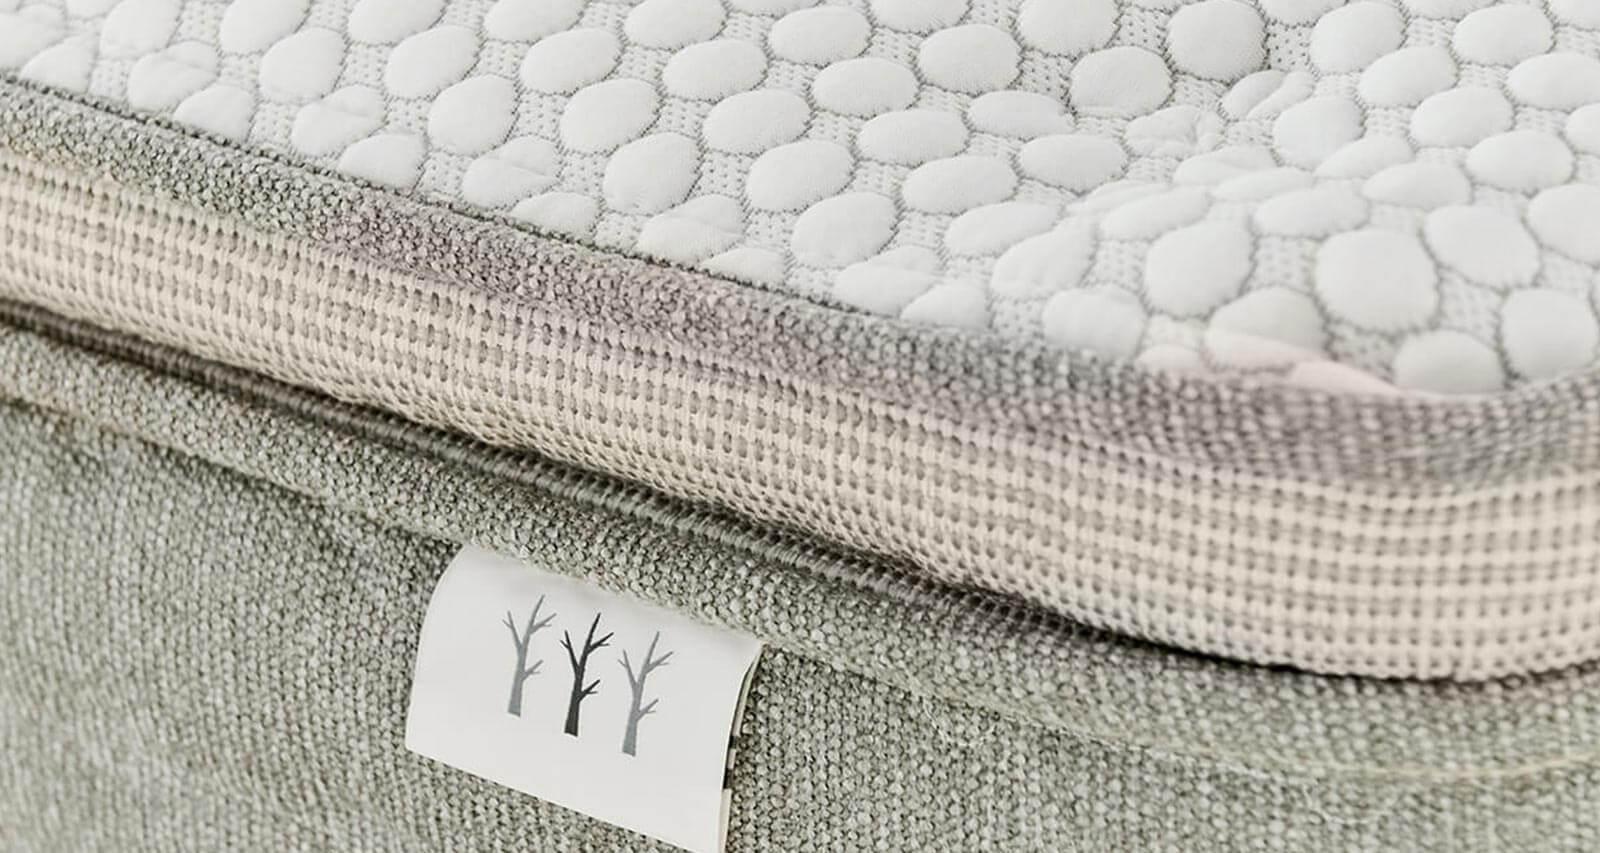 Brentwood Home Palmetto Latex Mattress Reviews, brentwood home mattress reviews